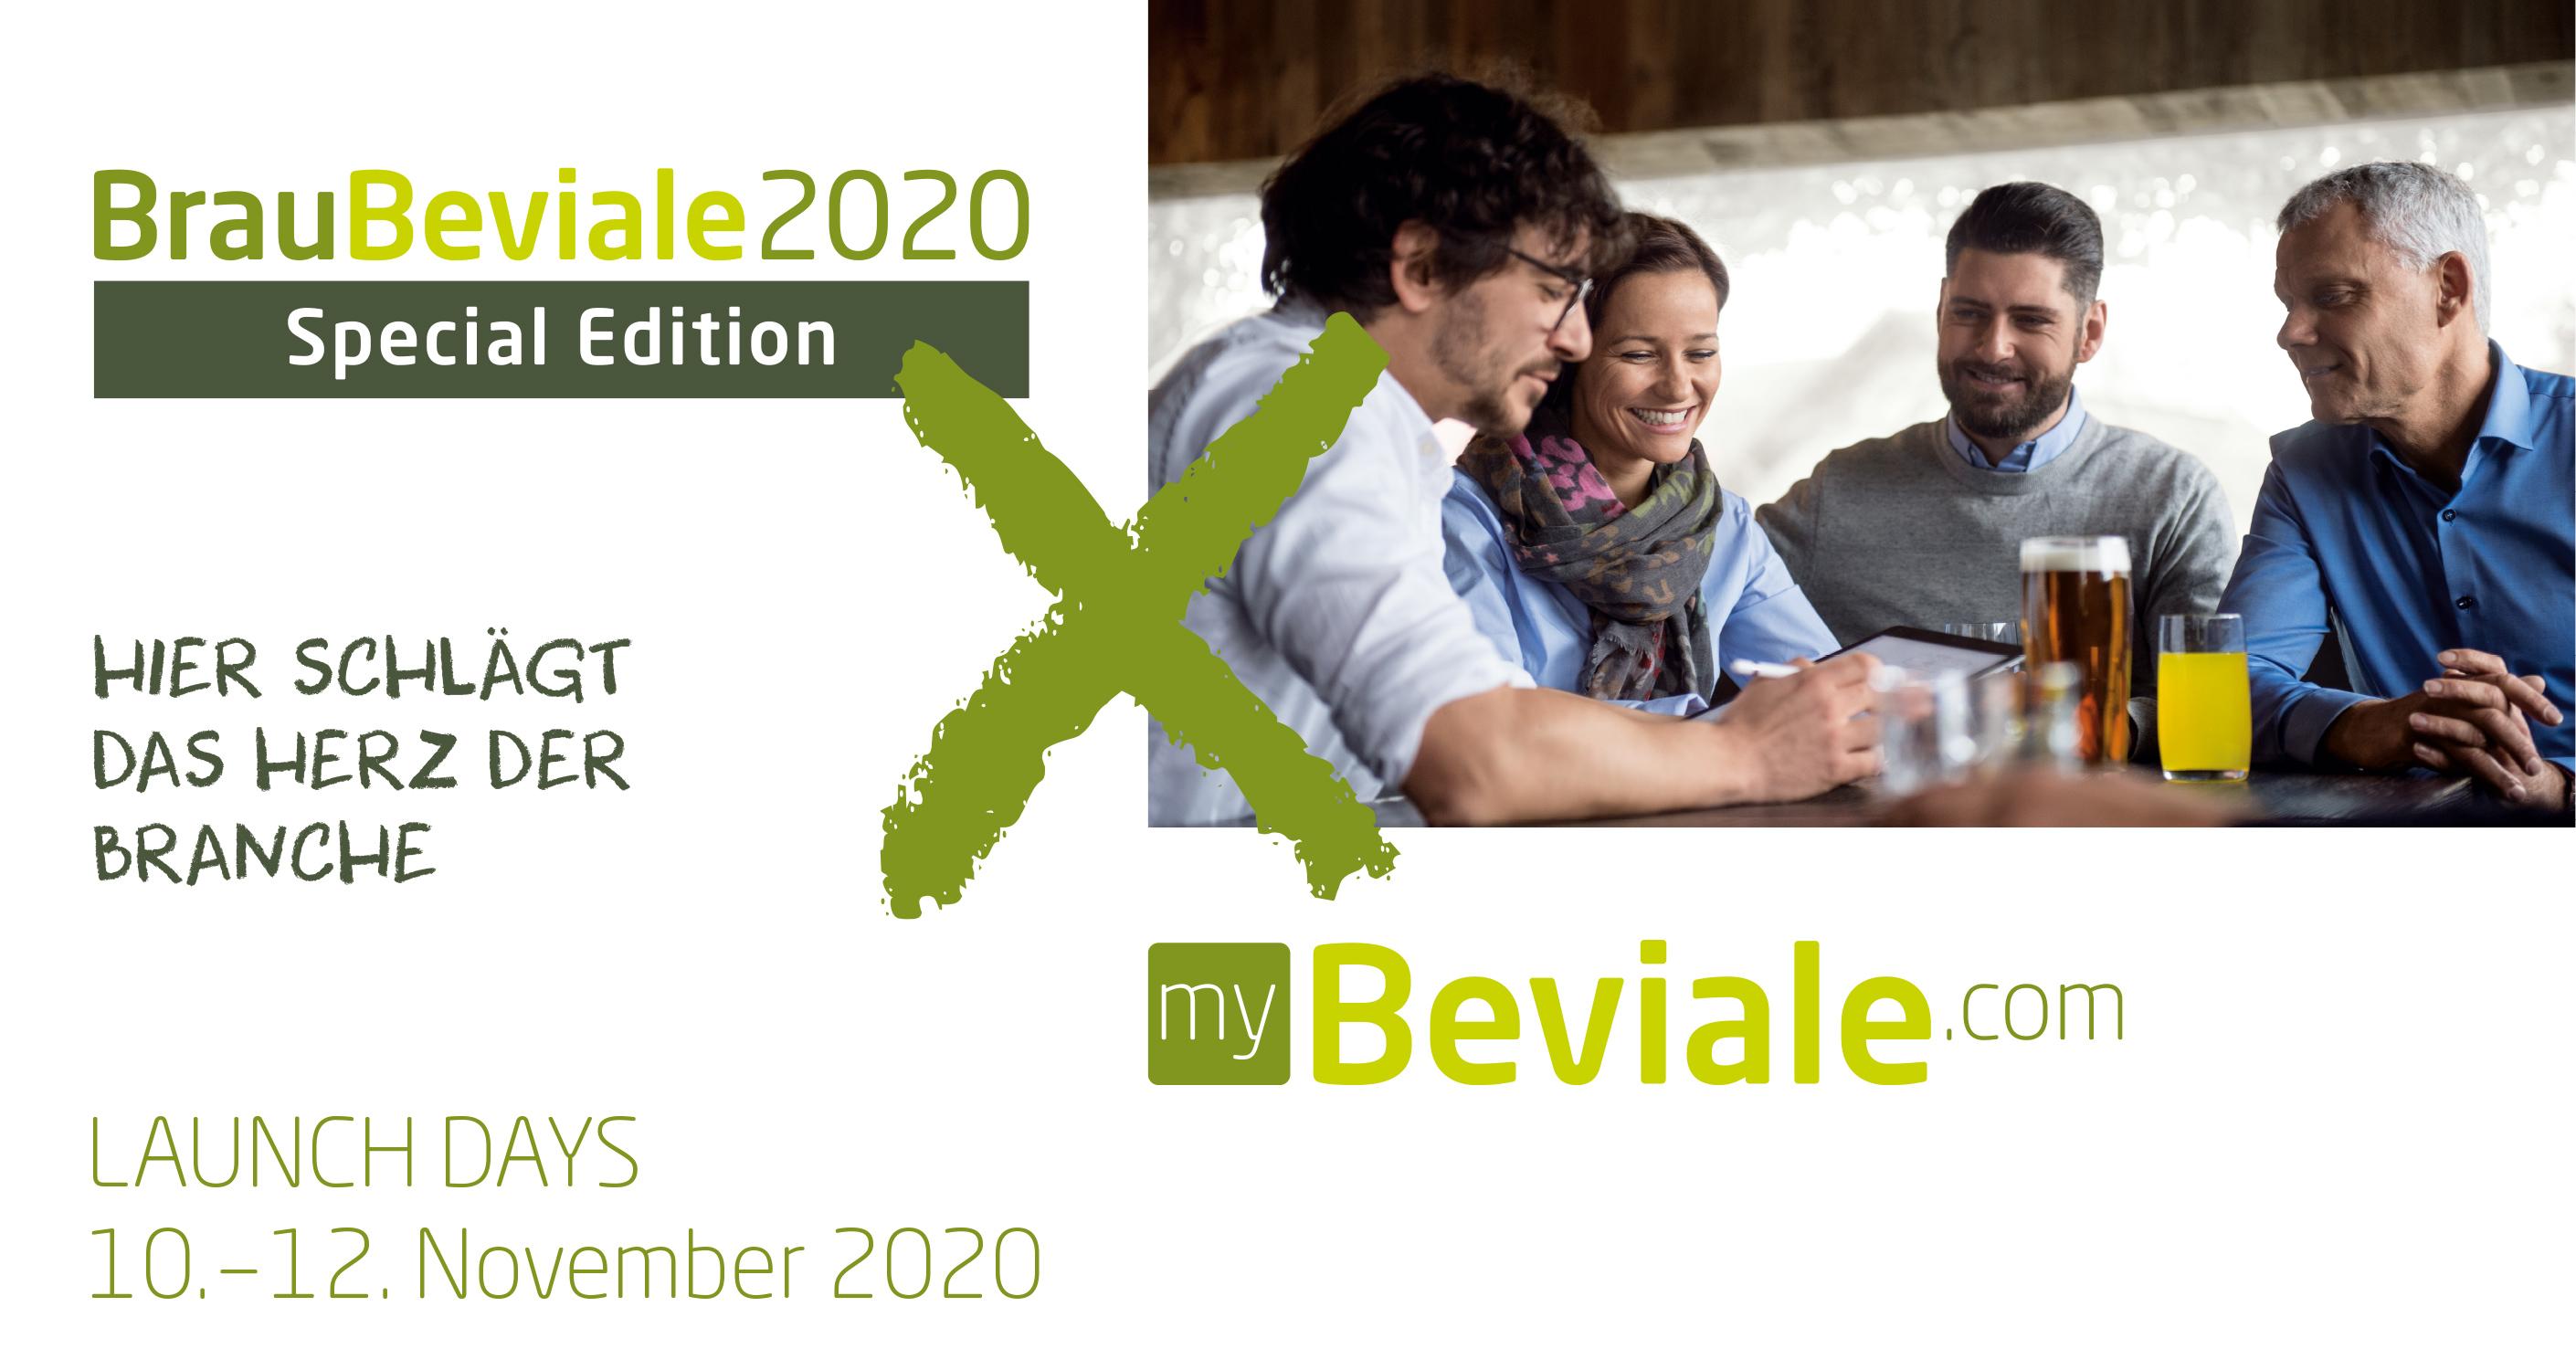 Header BrauBeviale Special Edition 2020 meets myBeviale.com